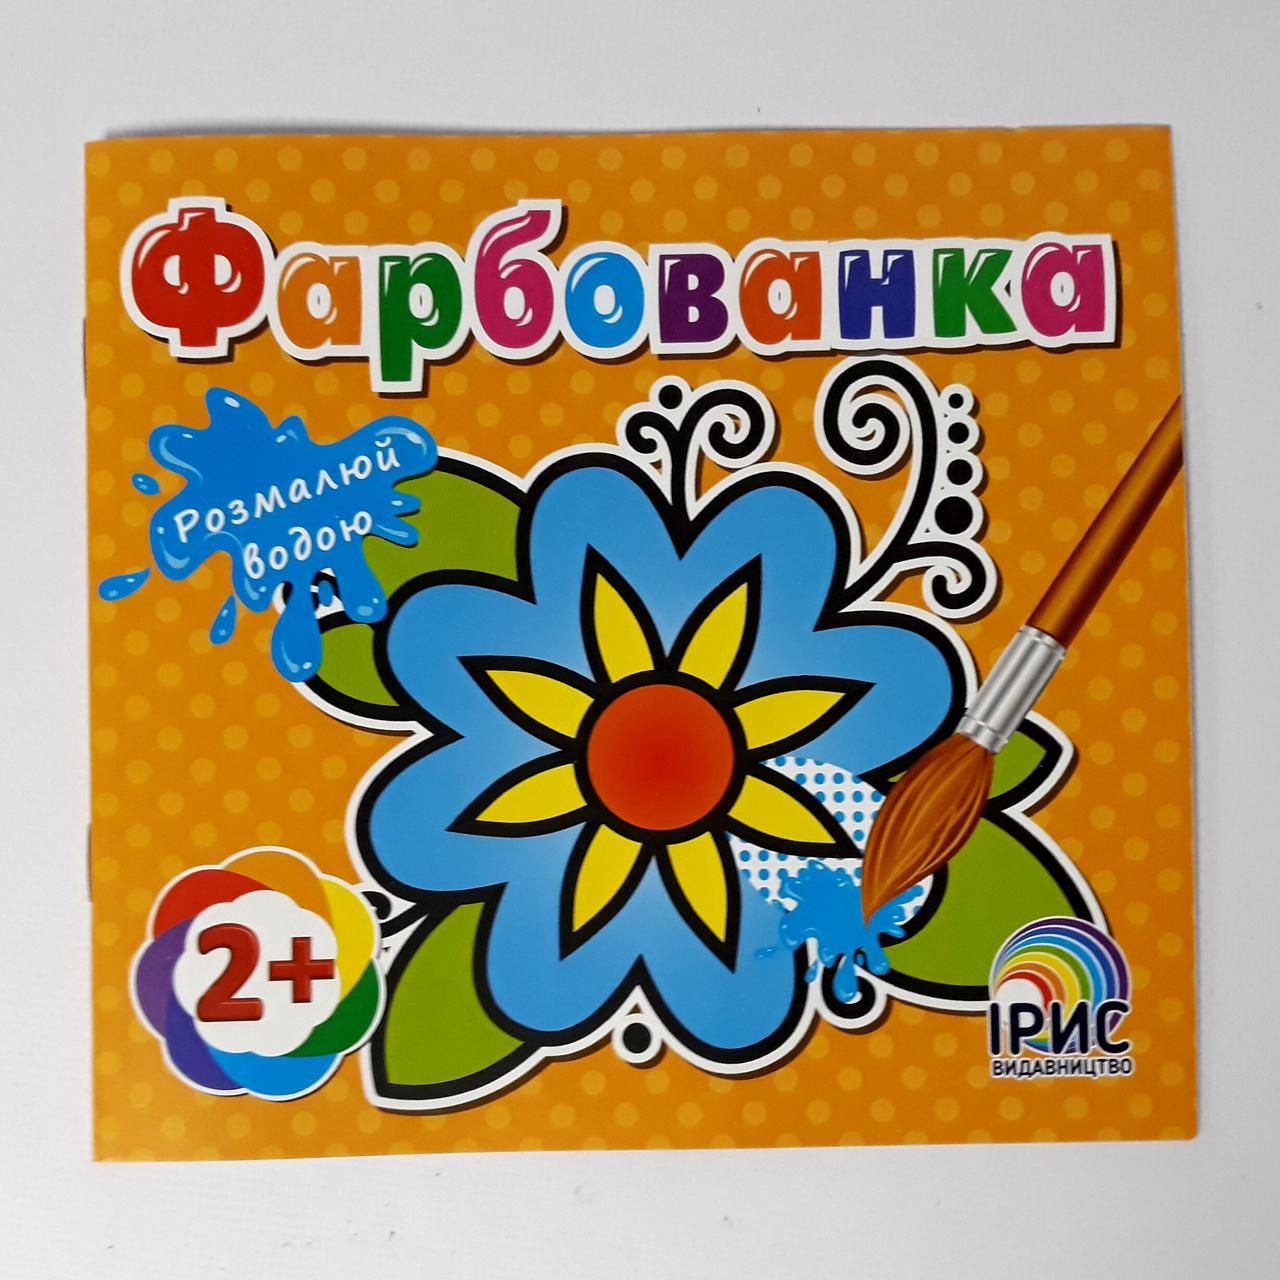 водная раскраска фарбованка цветок 93534 ирис украина продажа цена в запорожье раскраски от интернет магазин русалочка 658129030